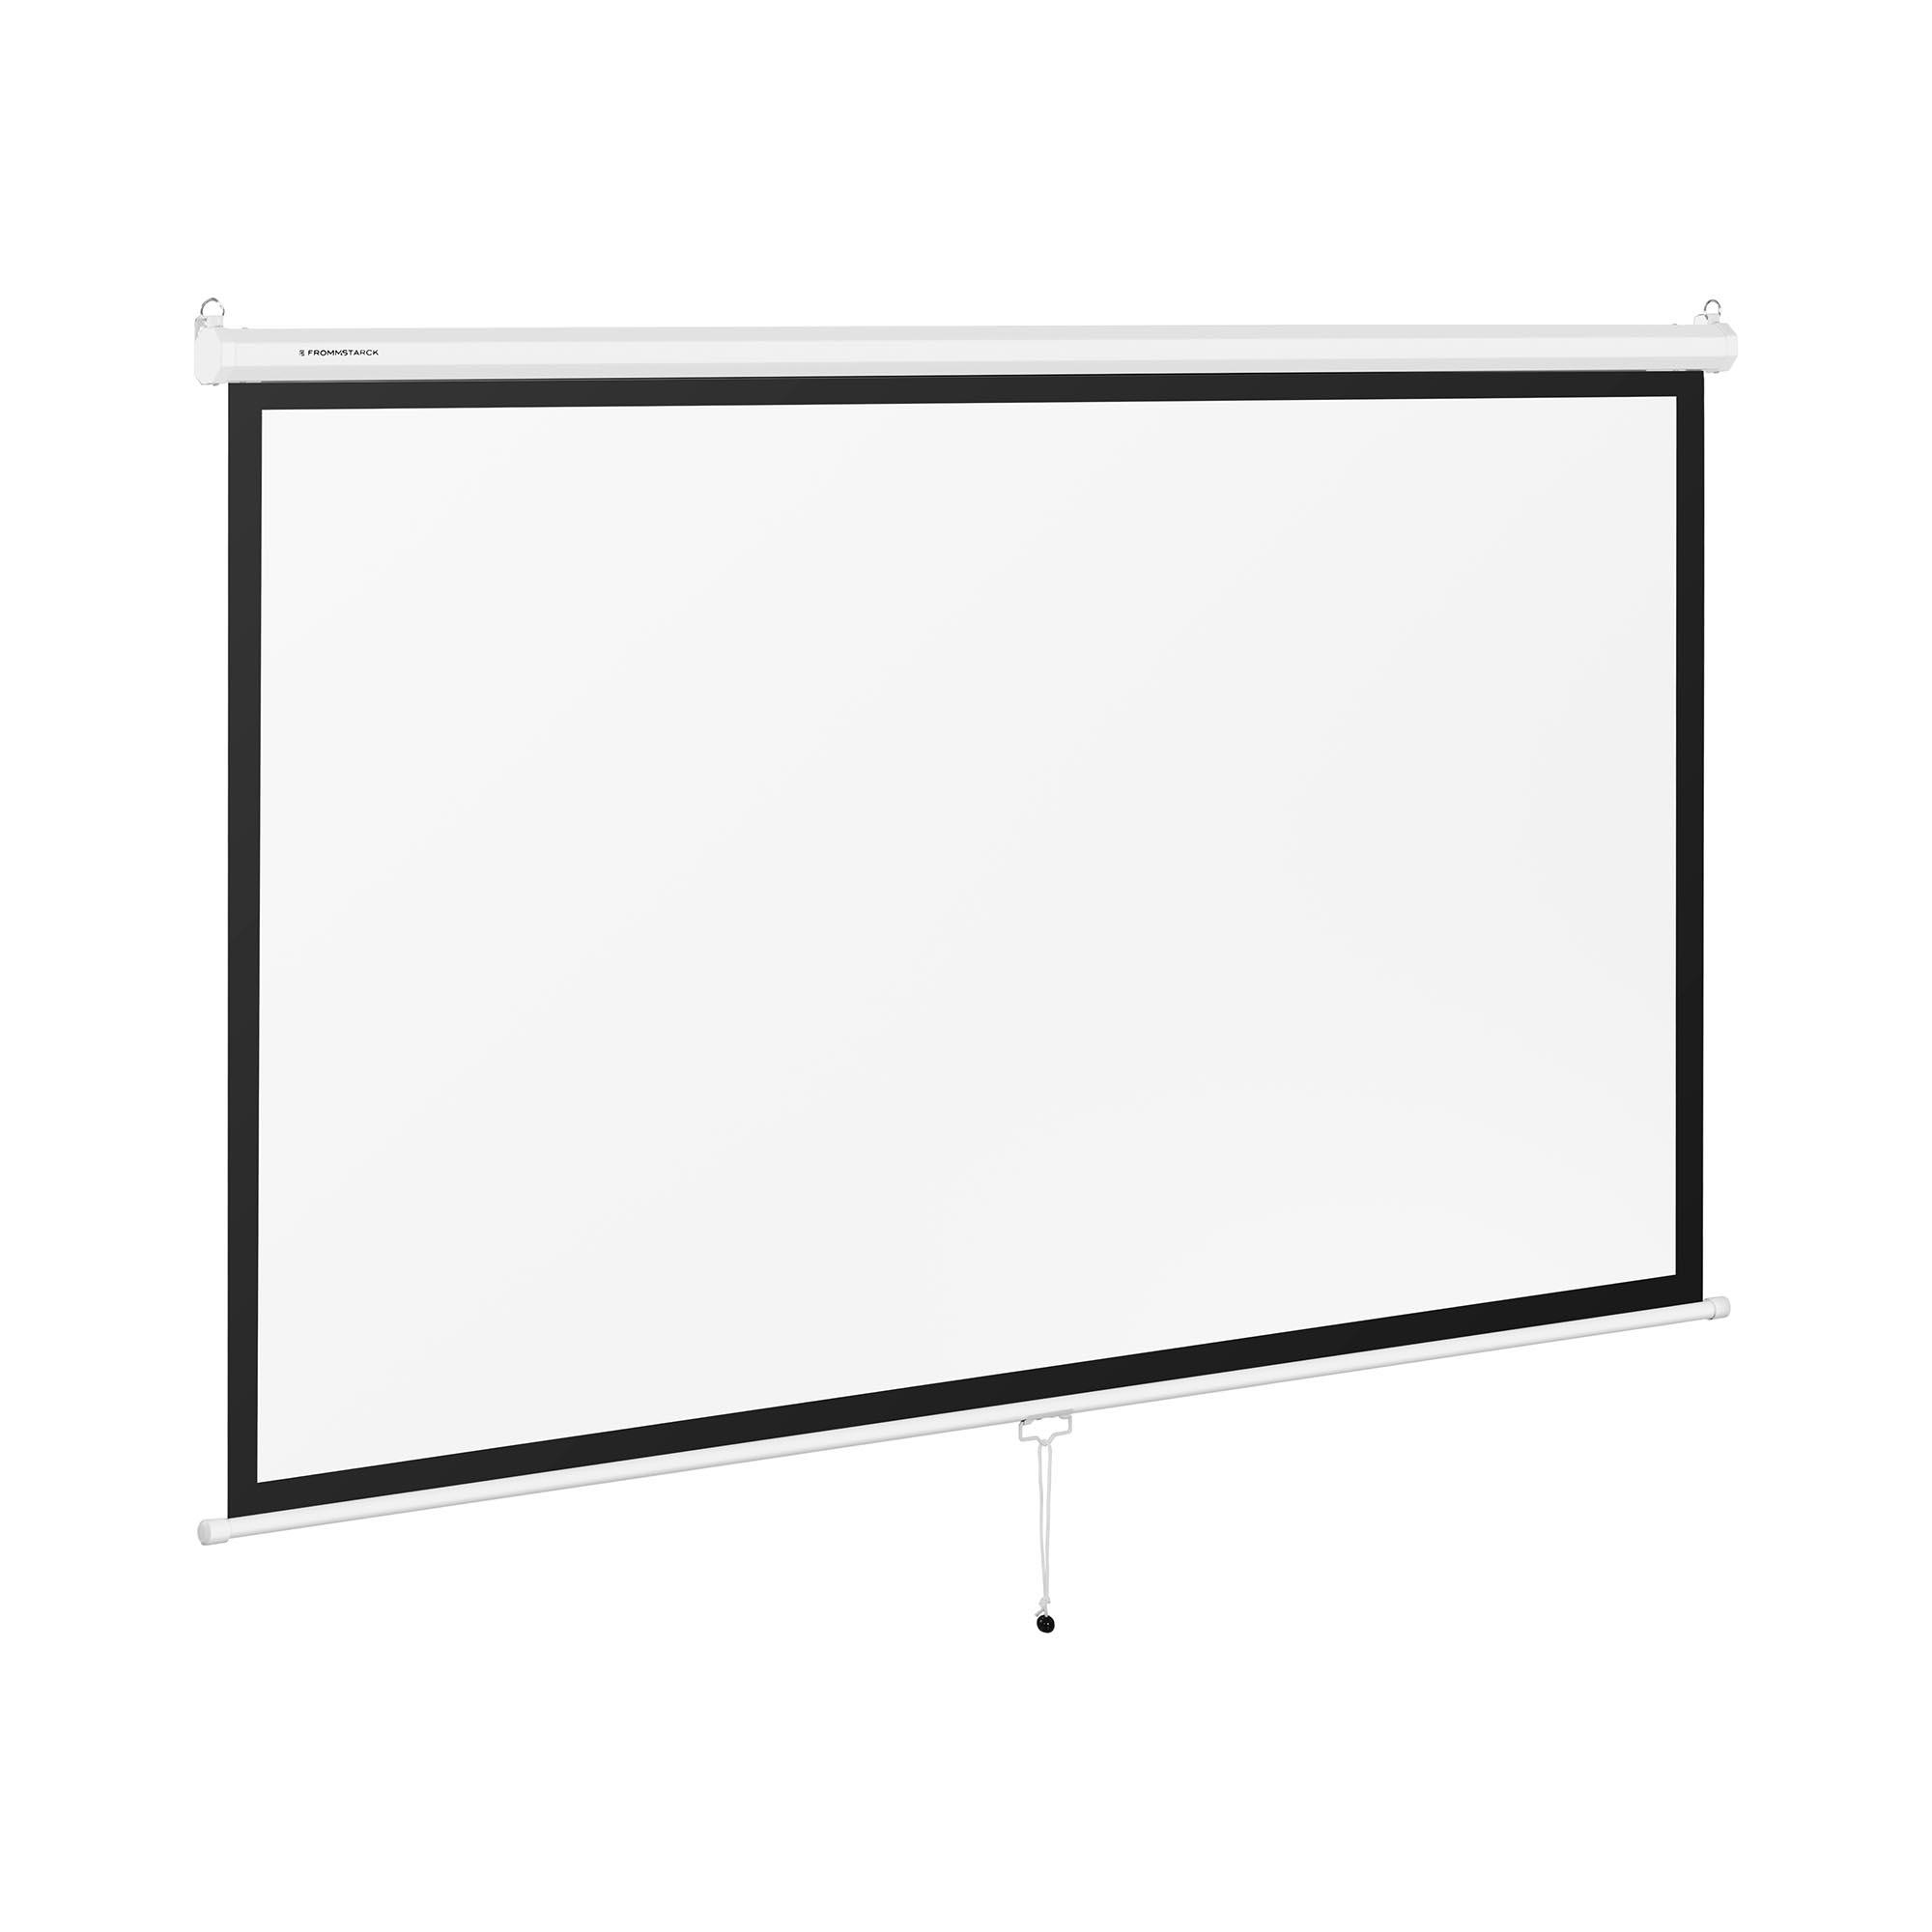 Fromm & Starck Beamerleinwand - 229,5 x 145 cm - 16:9 10260086